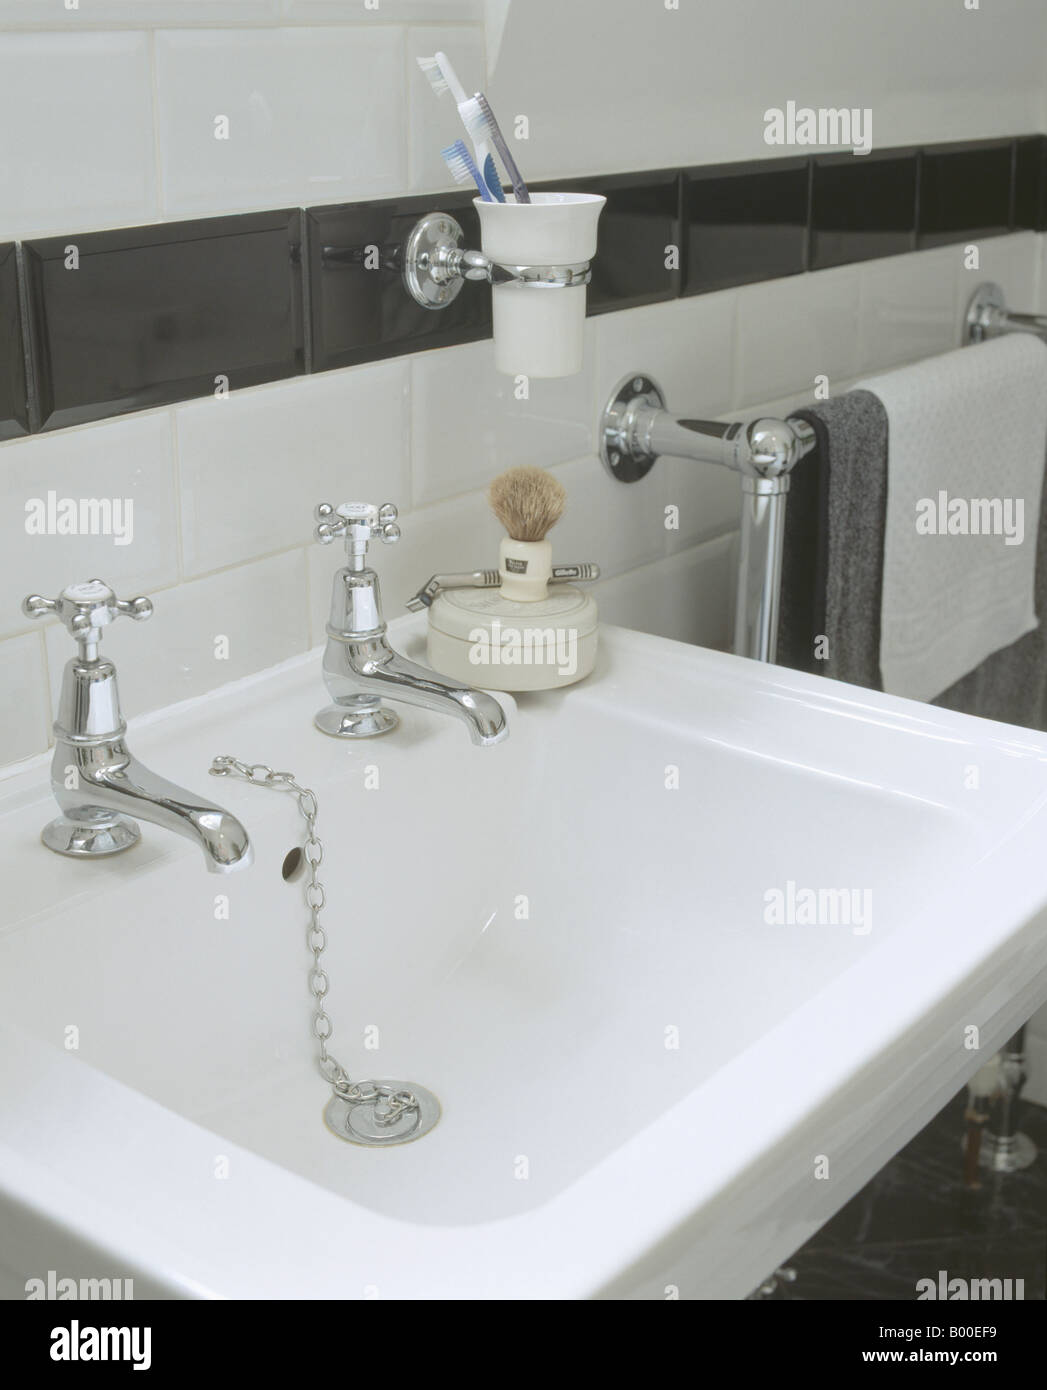 Wall mounted toothbrush holder on black tiled dado above white ...